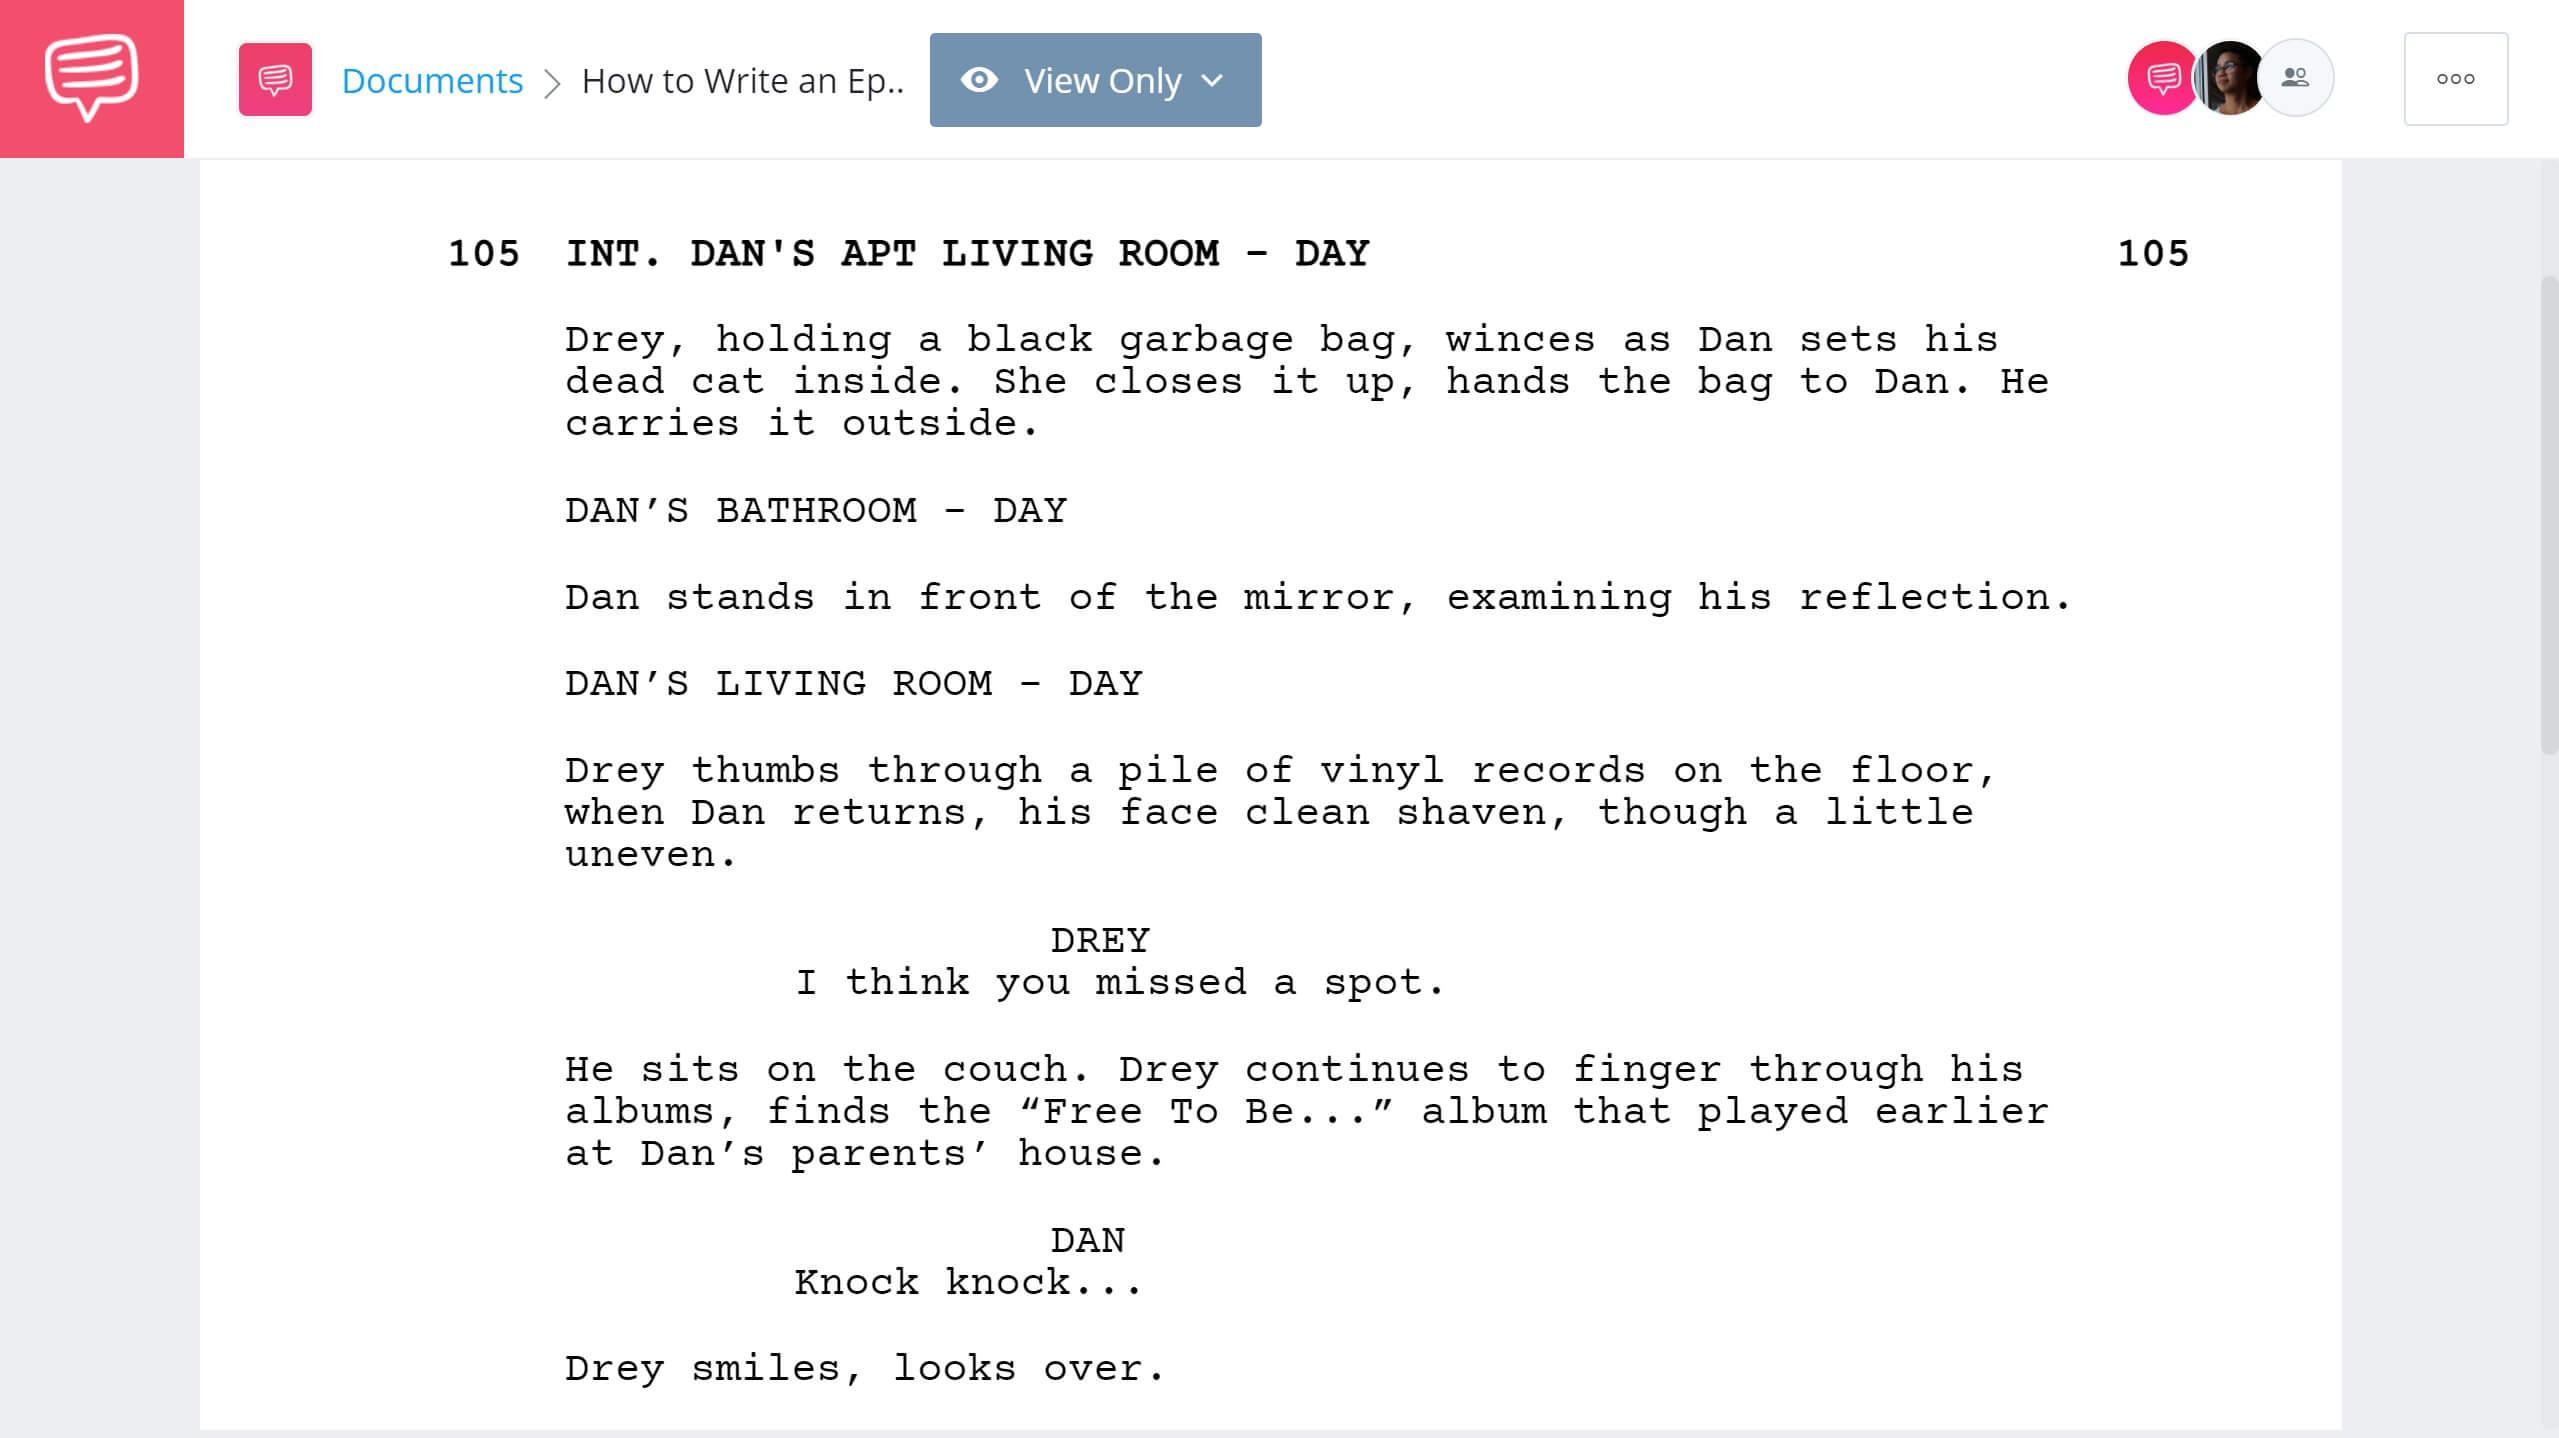 How to Write an Epilogue Half Nelson Example StudioBinder Screenwriting Software